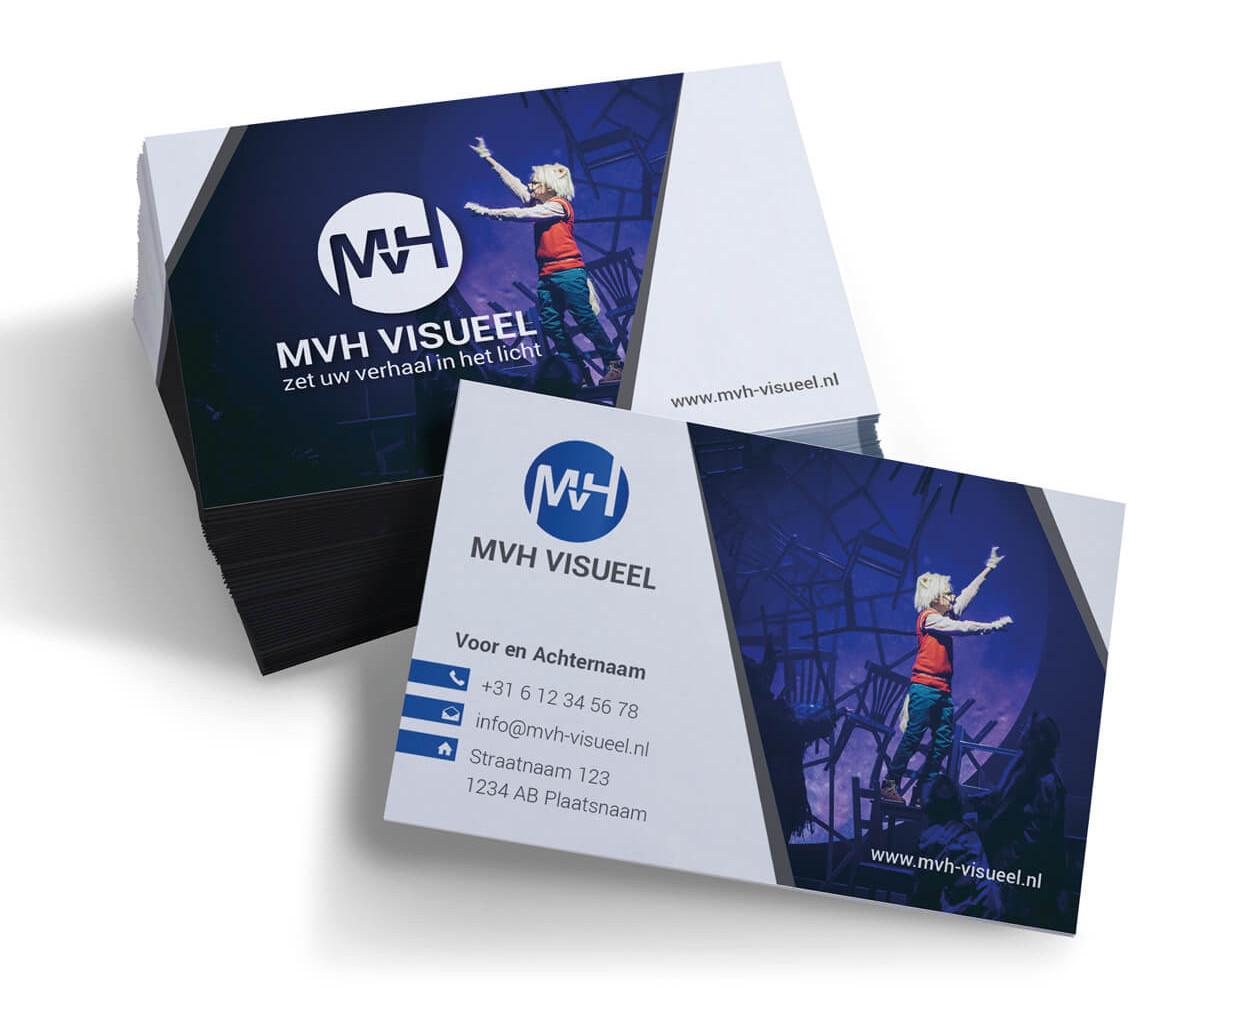 MVH Visueel